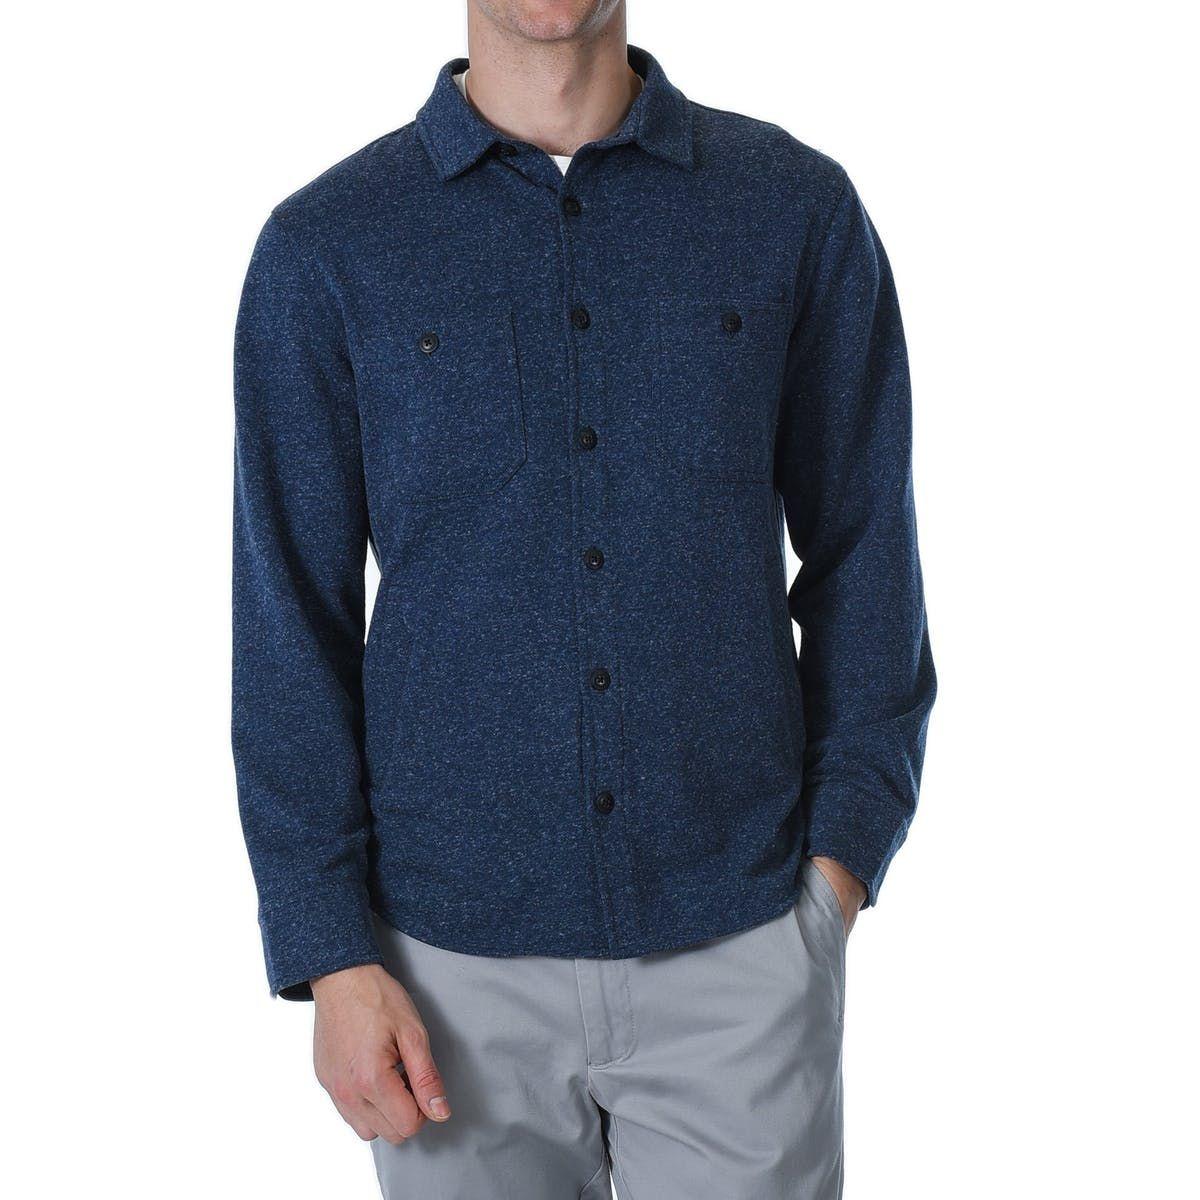 Baywater Fleece CPO Fleece shirt, Shirt jacket, Stylish